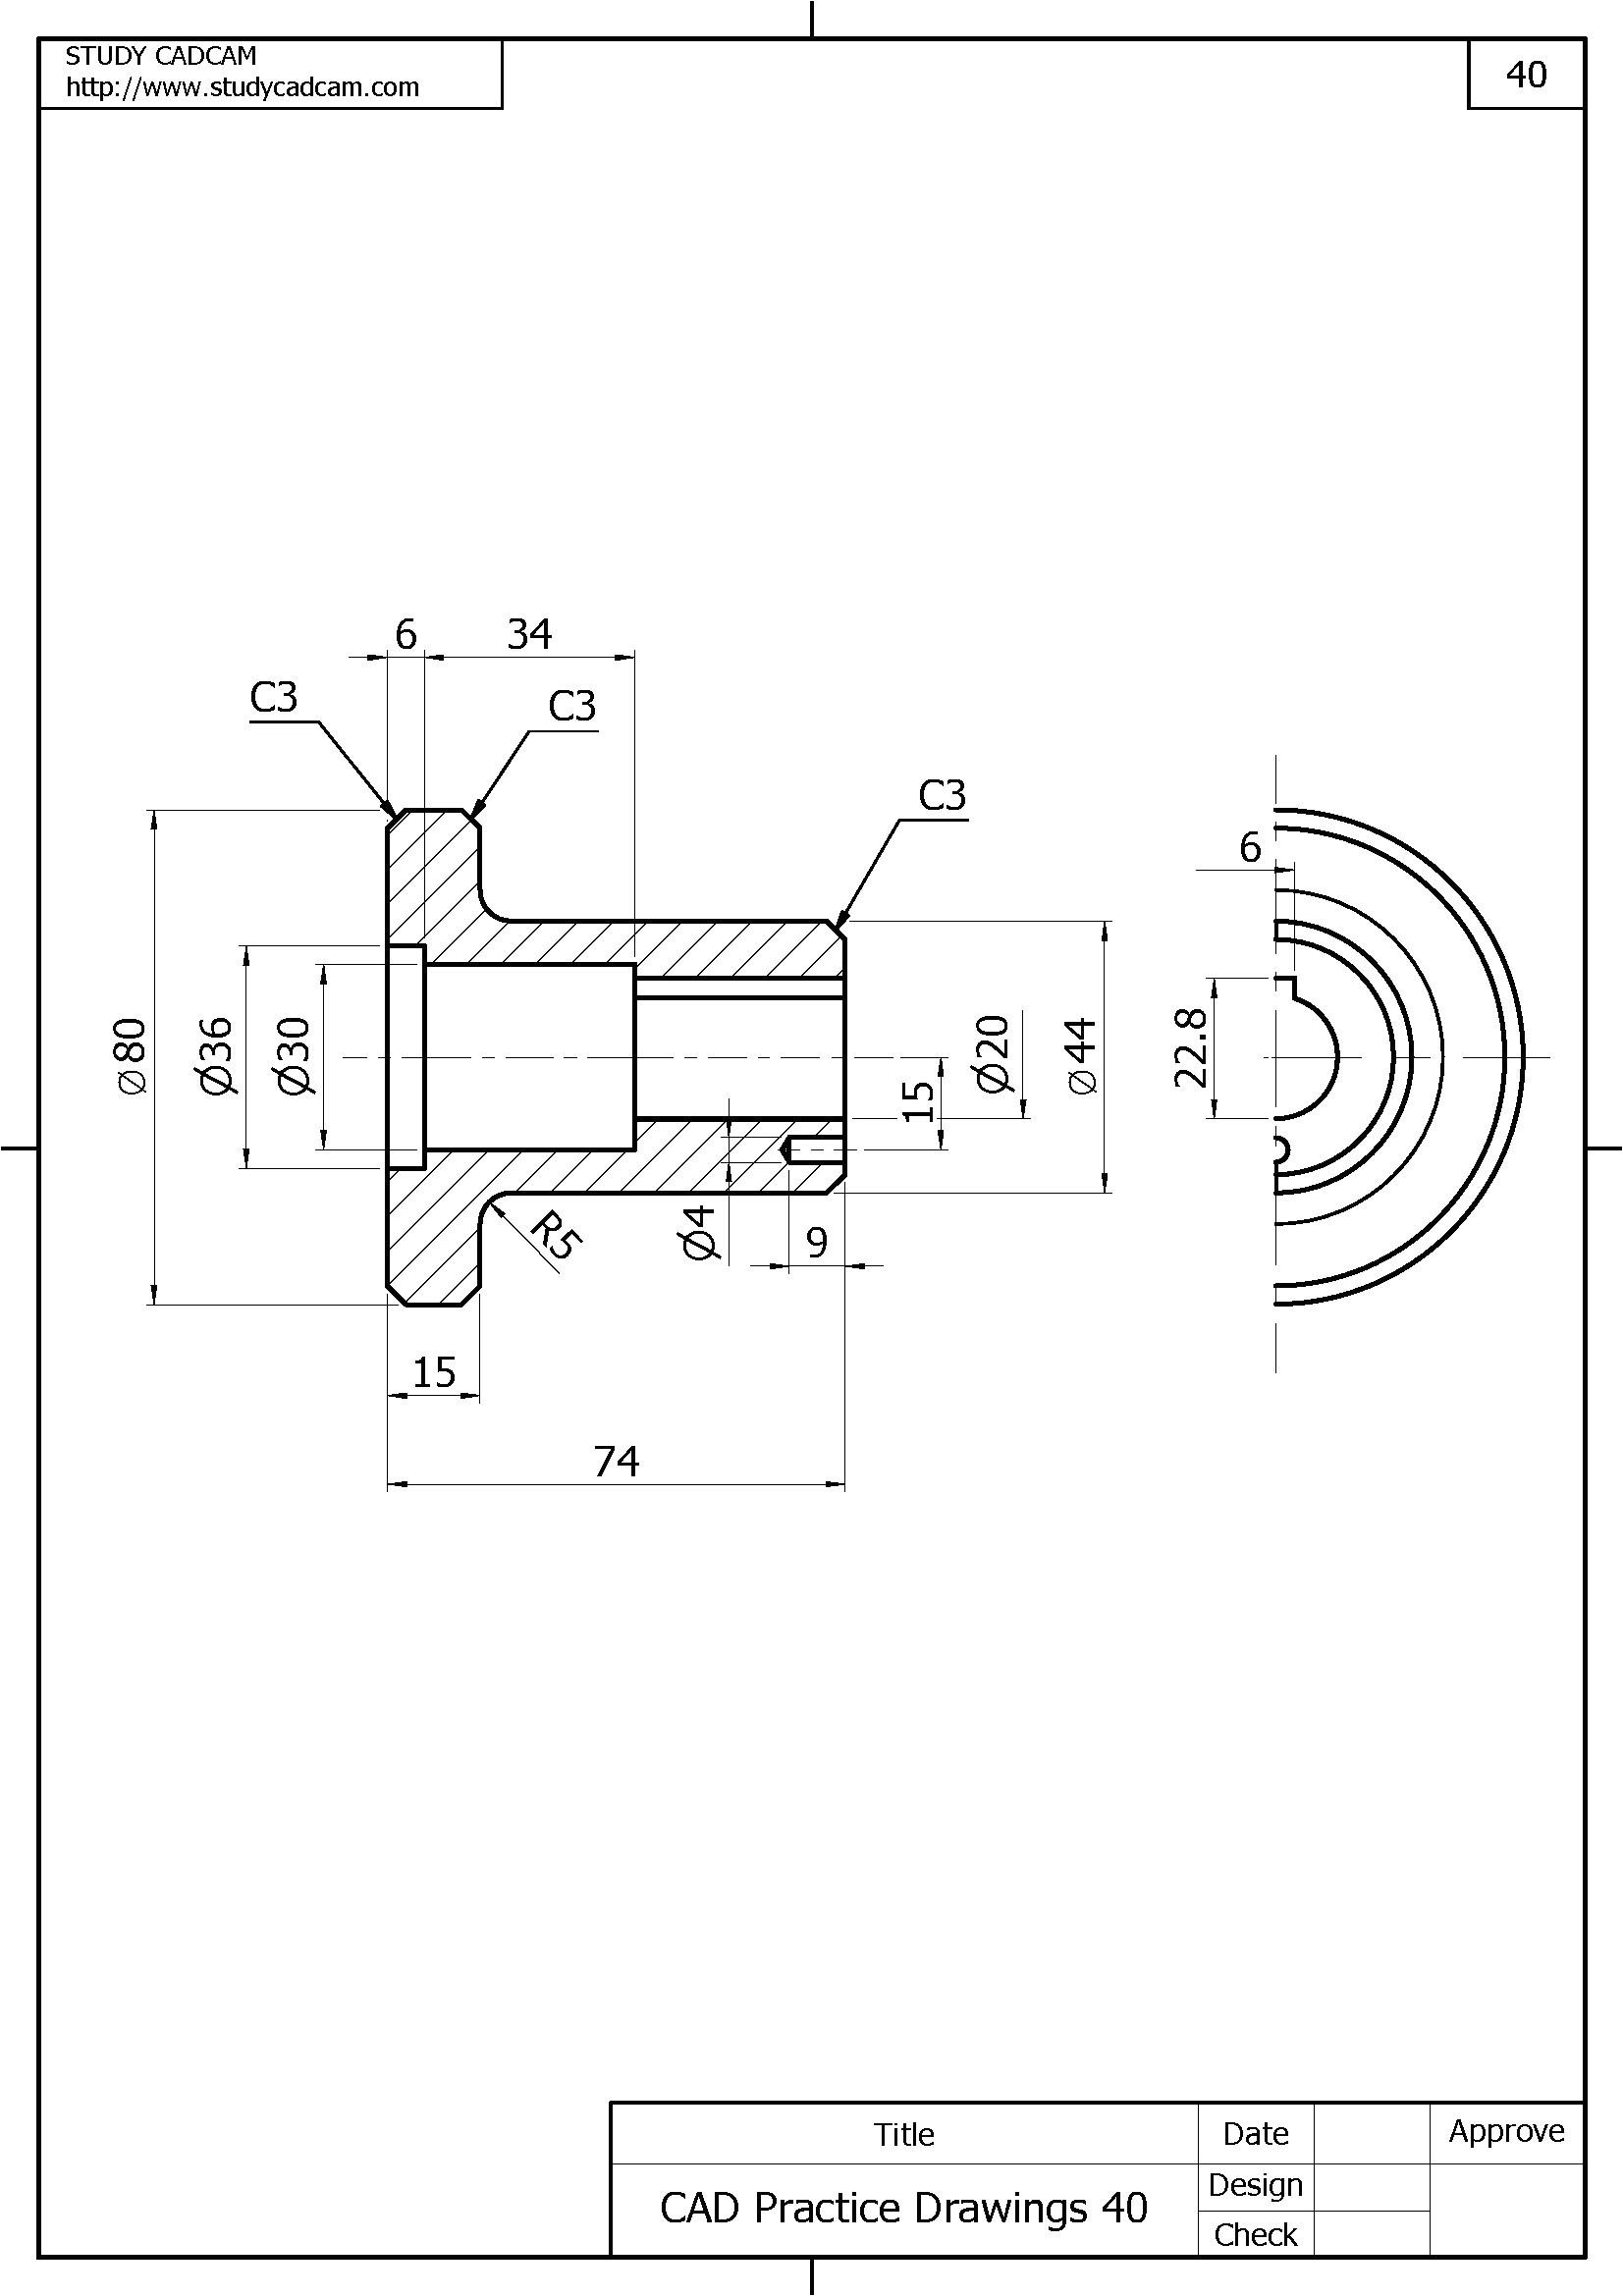 hvac wire diagram wiring diagram databasehvac wiring diagram sample